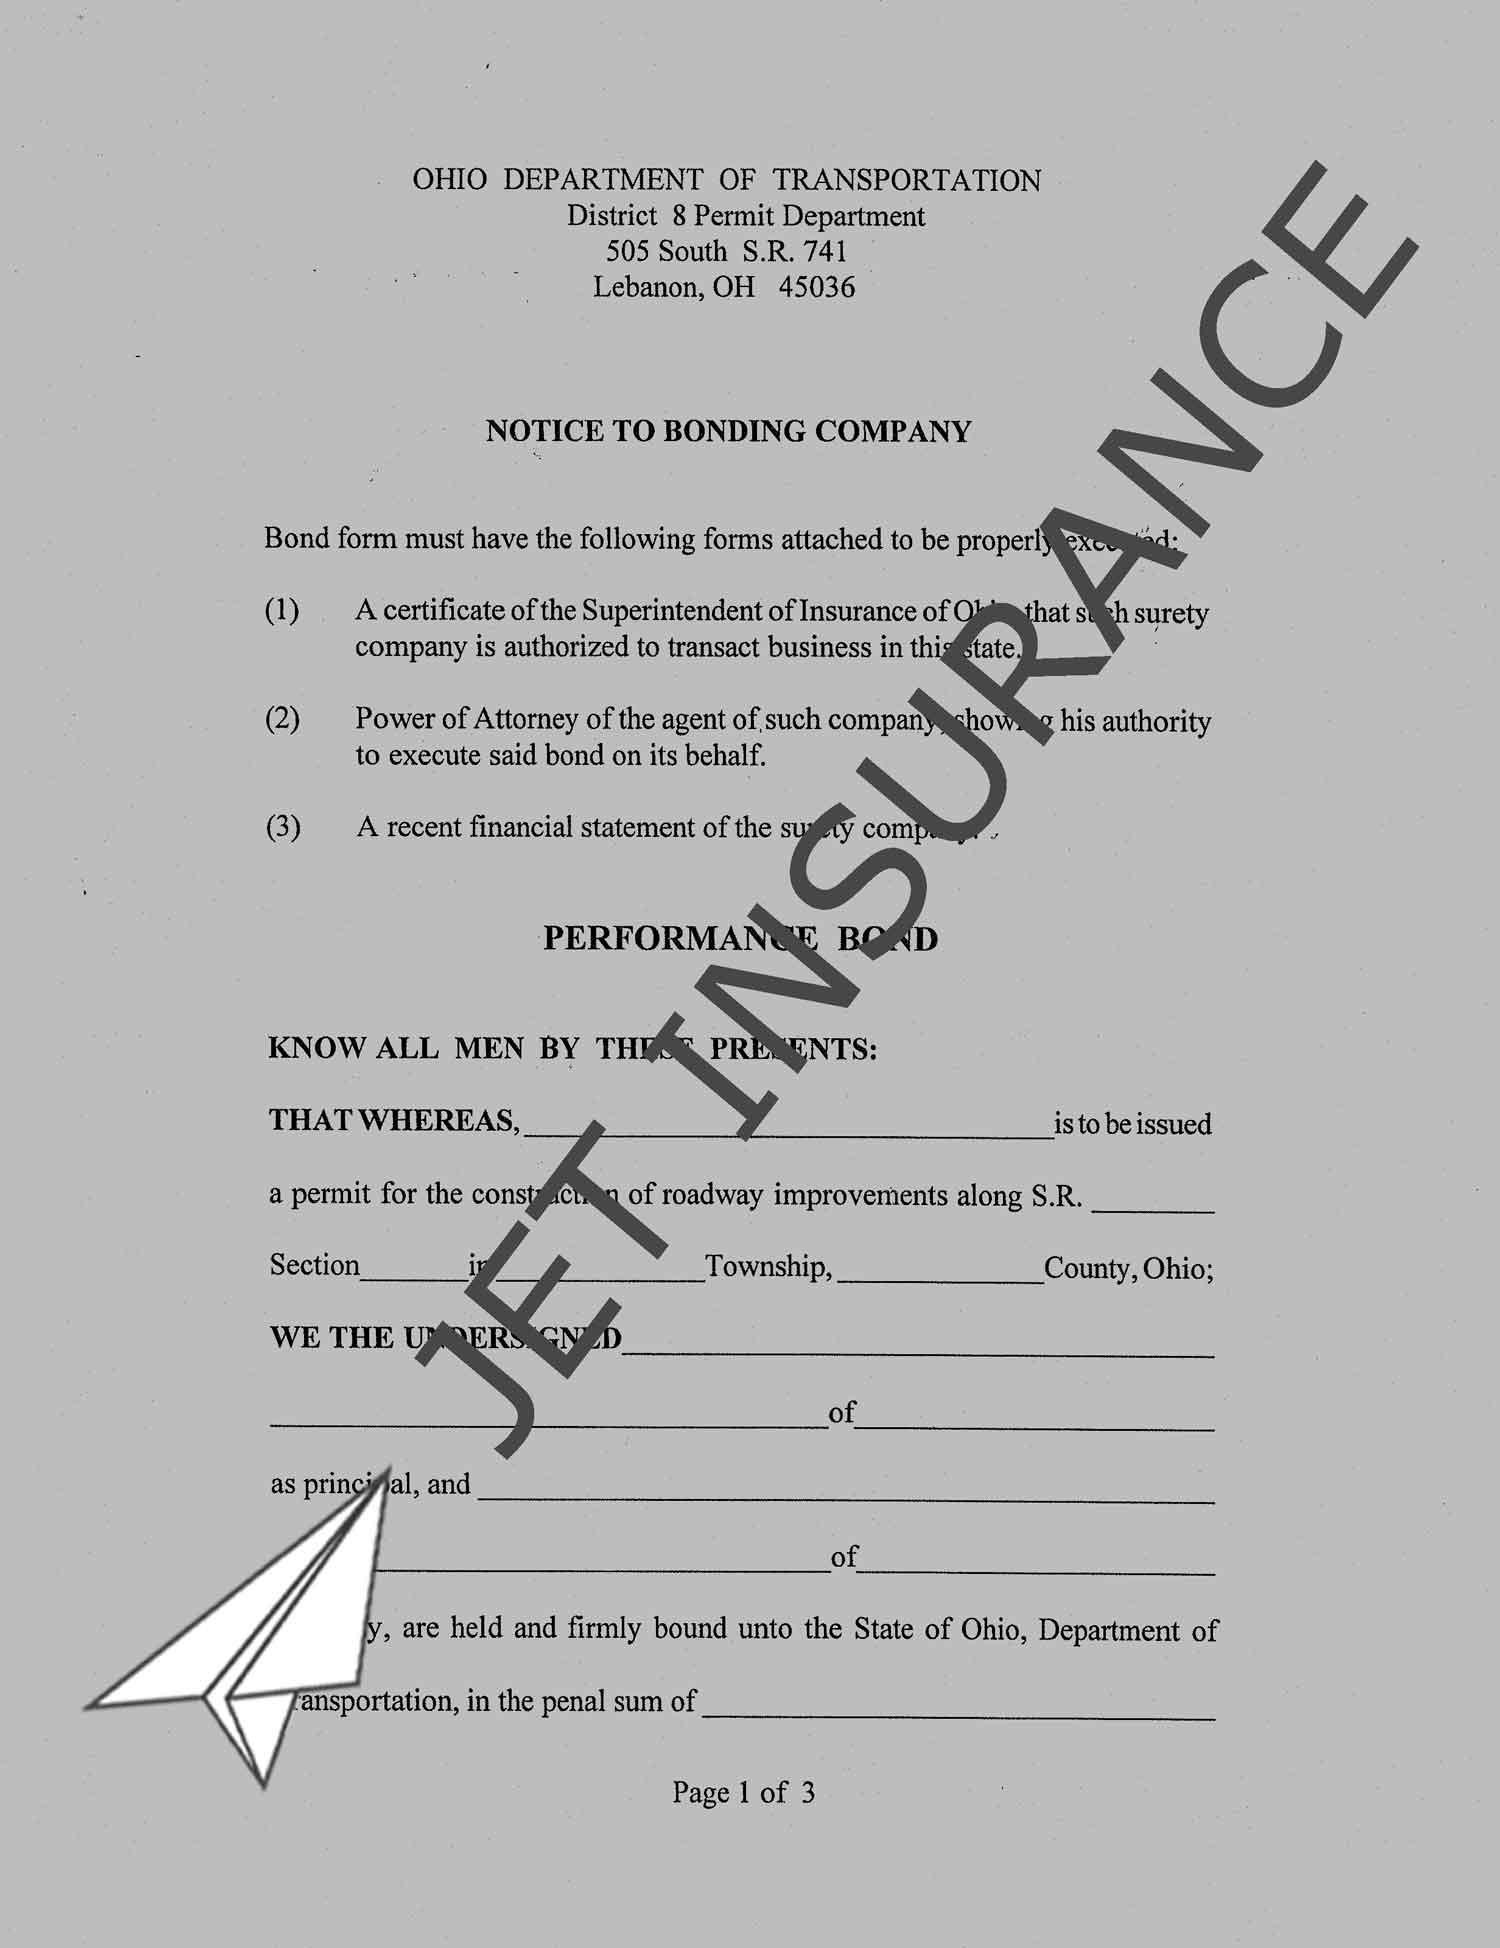 Ohio District 8 (Lebanon) Road Performance Permit Bond Form